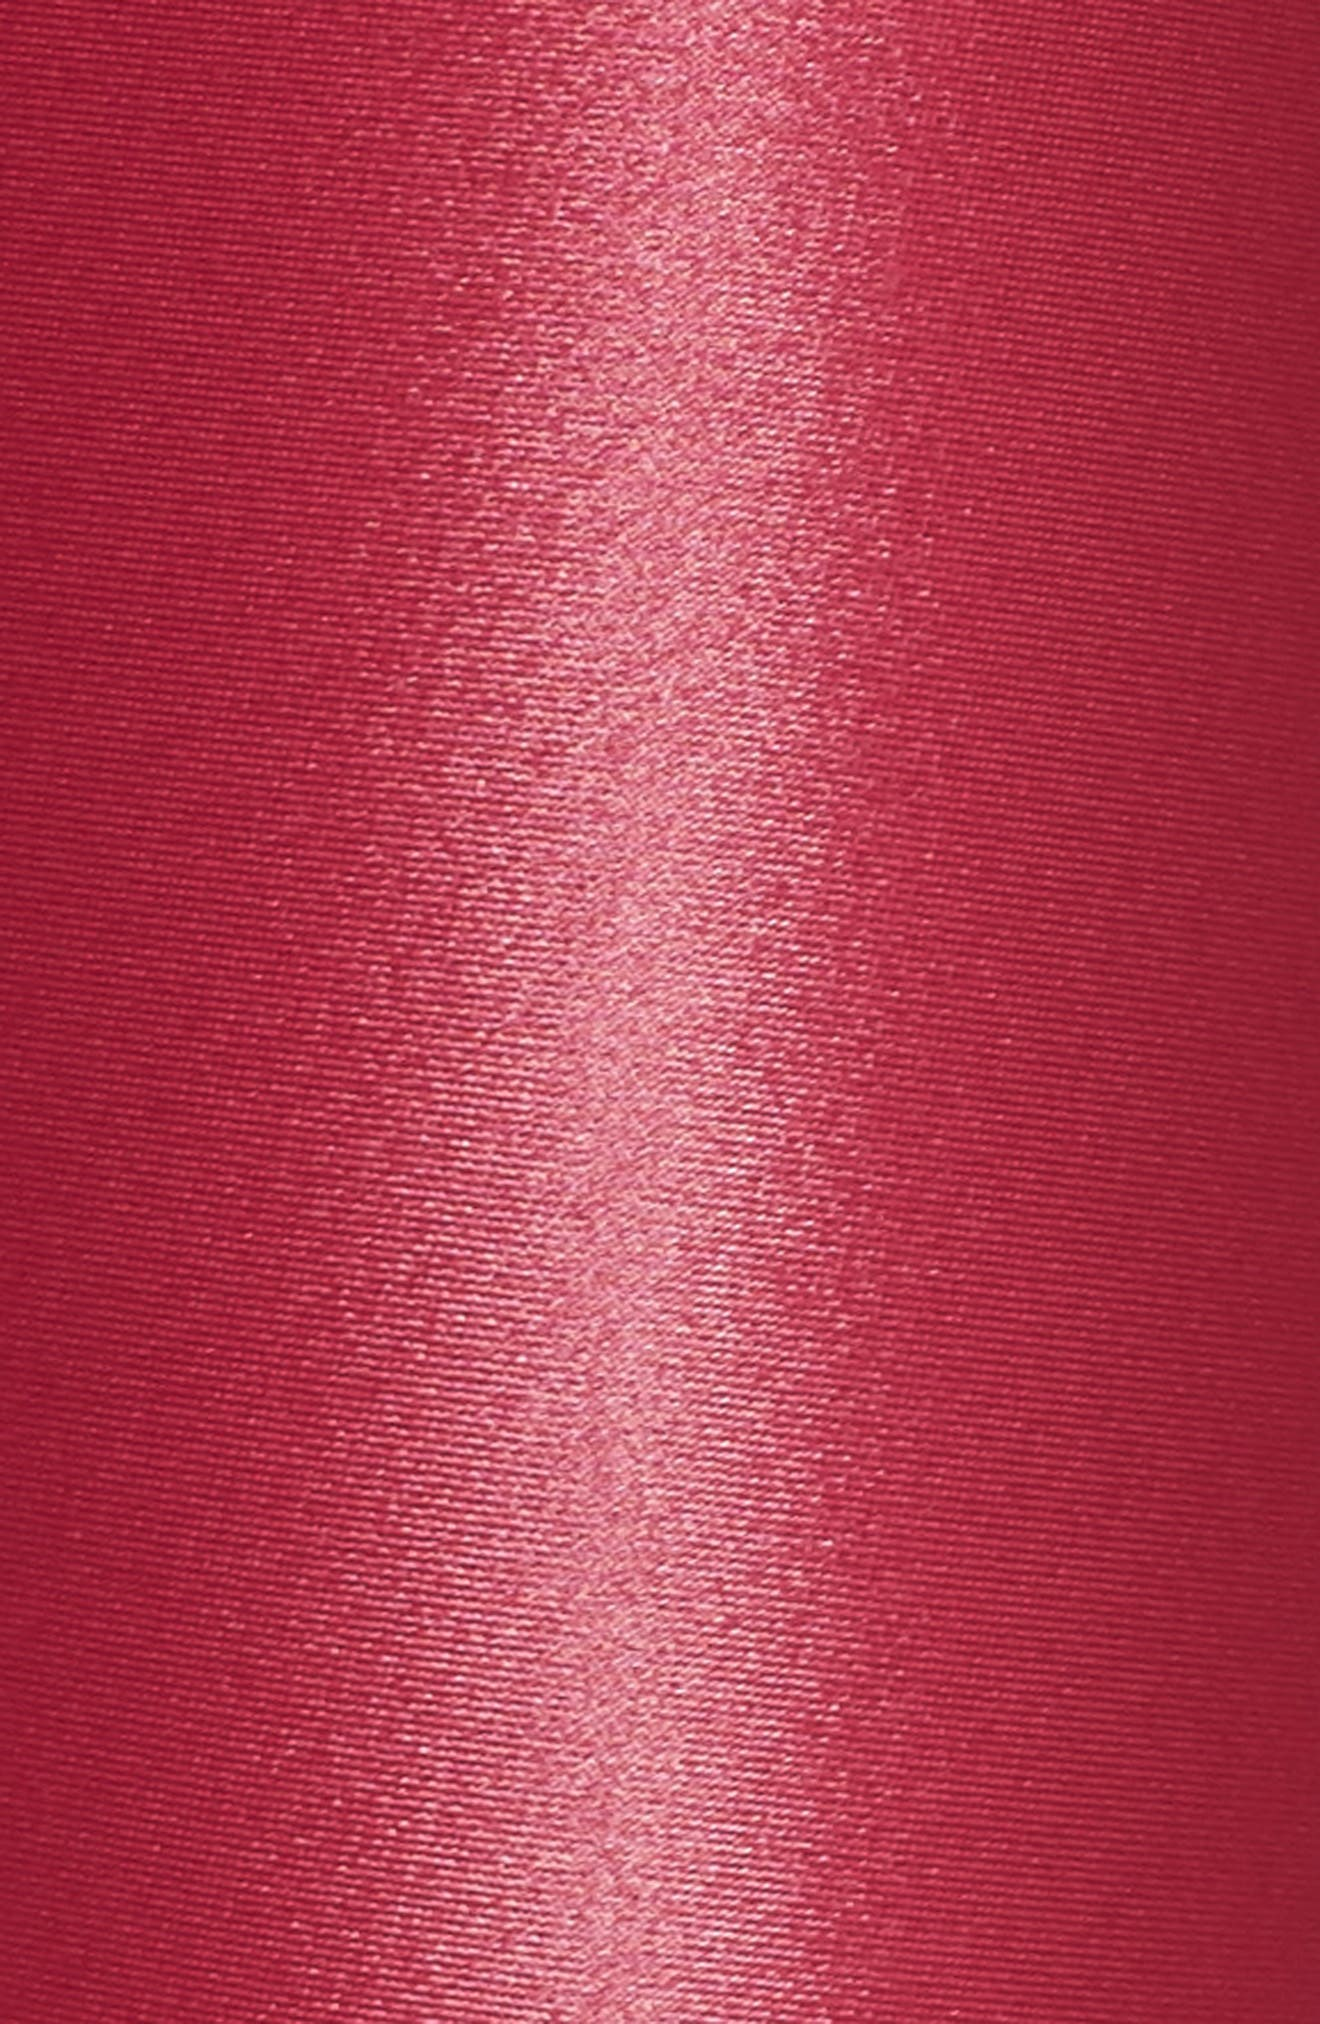 Surrey Lustrous Two Tone Leggings,                             Alternate thumbnail 7, color,                             Azalea/ Black